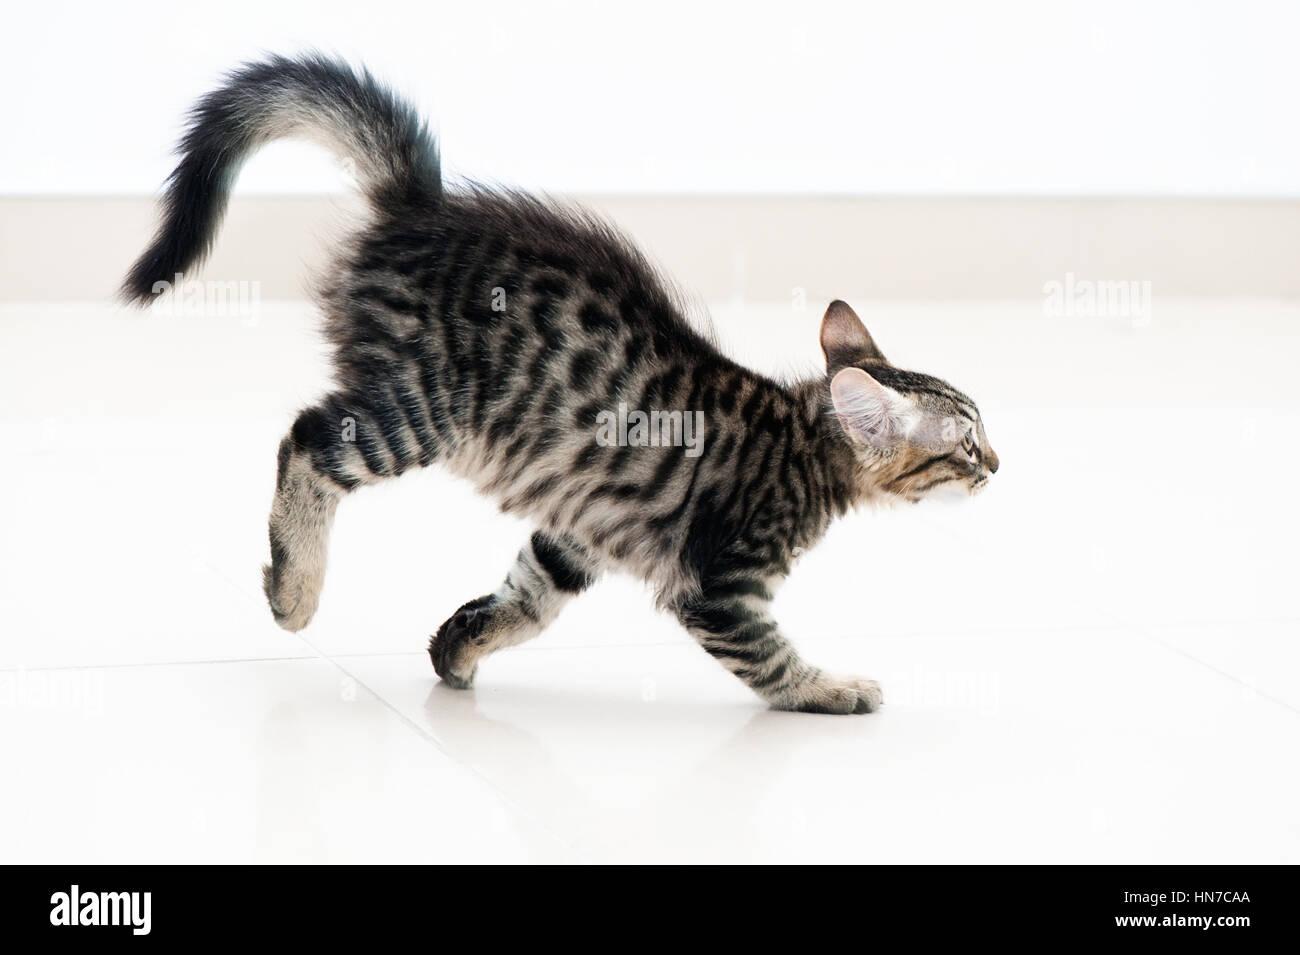 Tabby Kitten Running Stockfotos & Tabby Kitten Running Bilder - Alamy